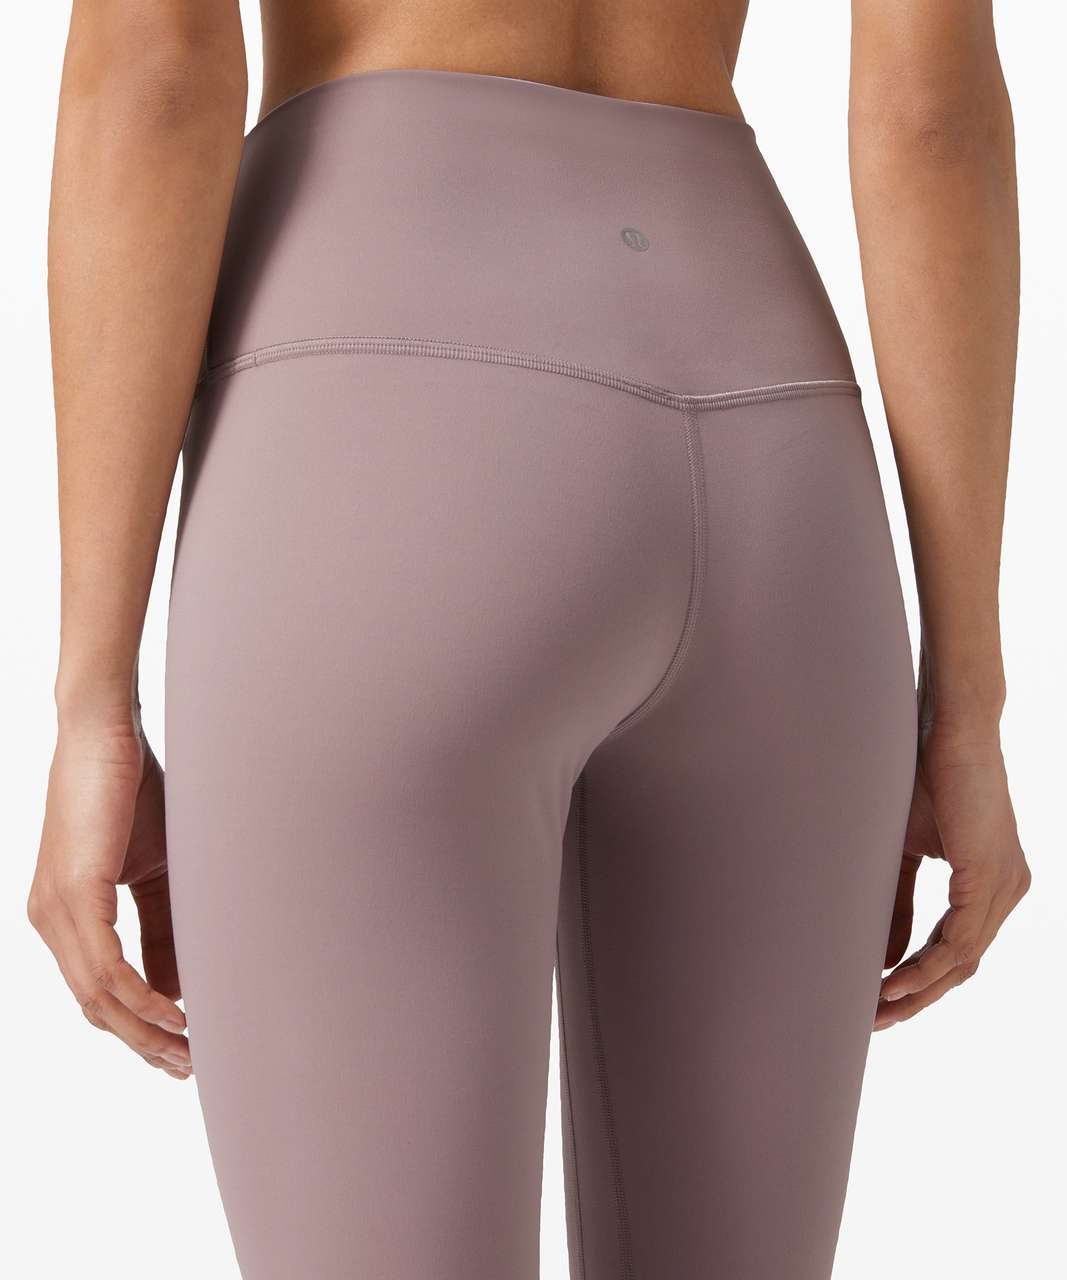 "Lululemon Align Pant II 25"" *Cool - Violet Verbena"